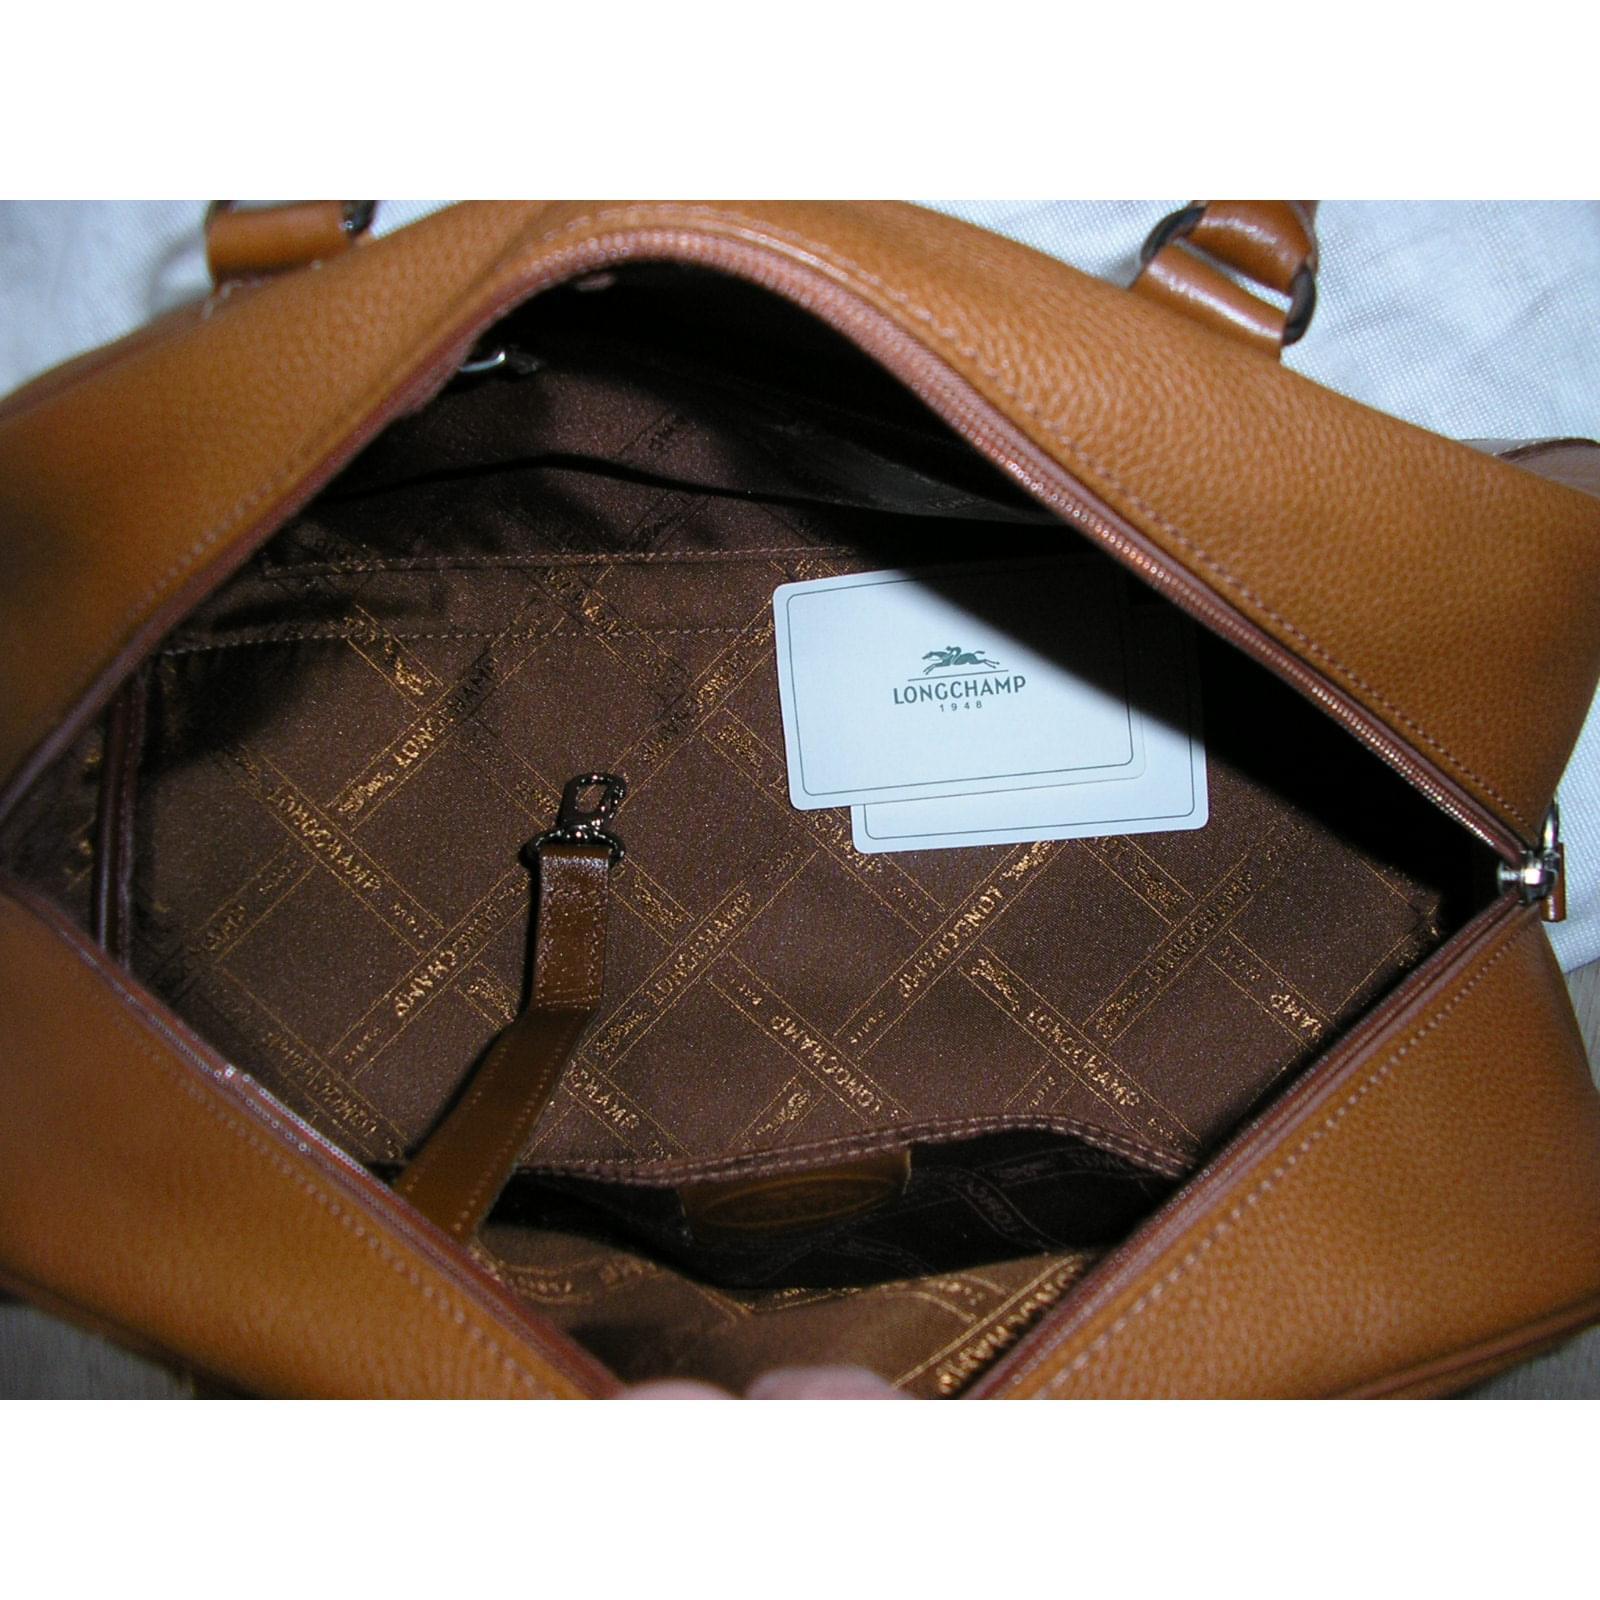 Borse Bowling Ref Caramel Longchamp Borsa Caramello Leather wwgq8r